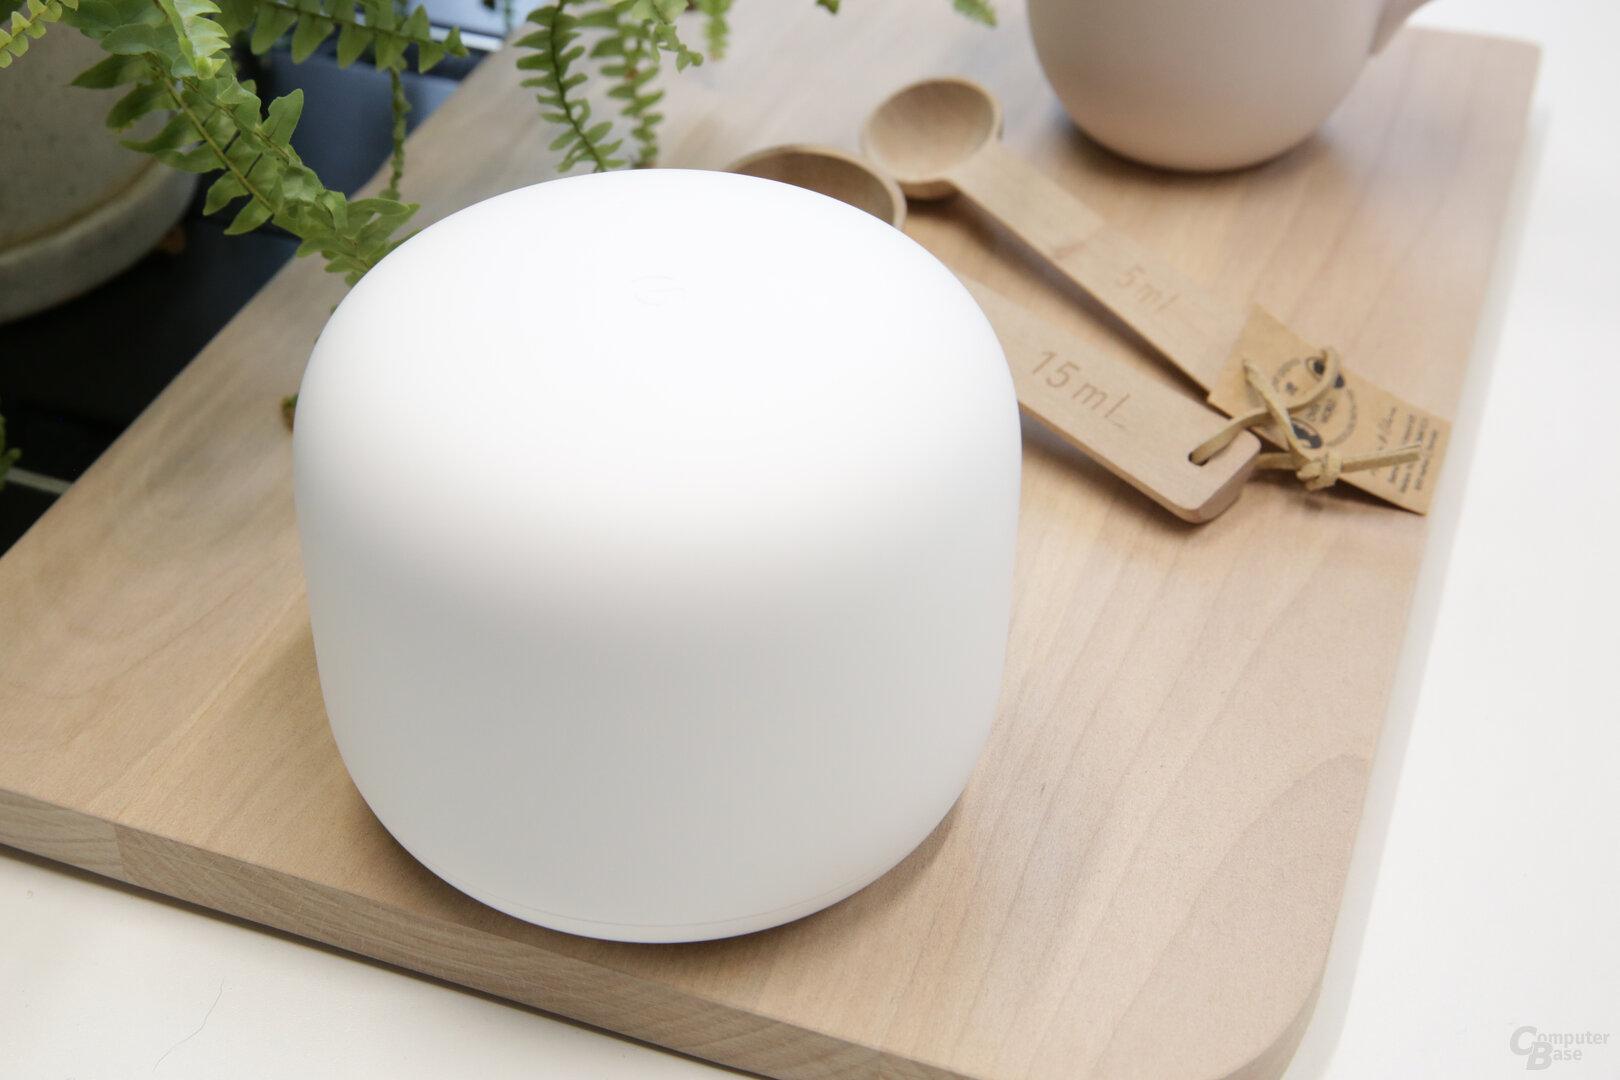 Google Nest Wifi ausprobiert